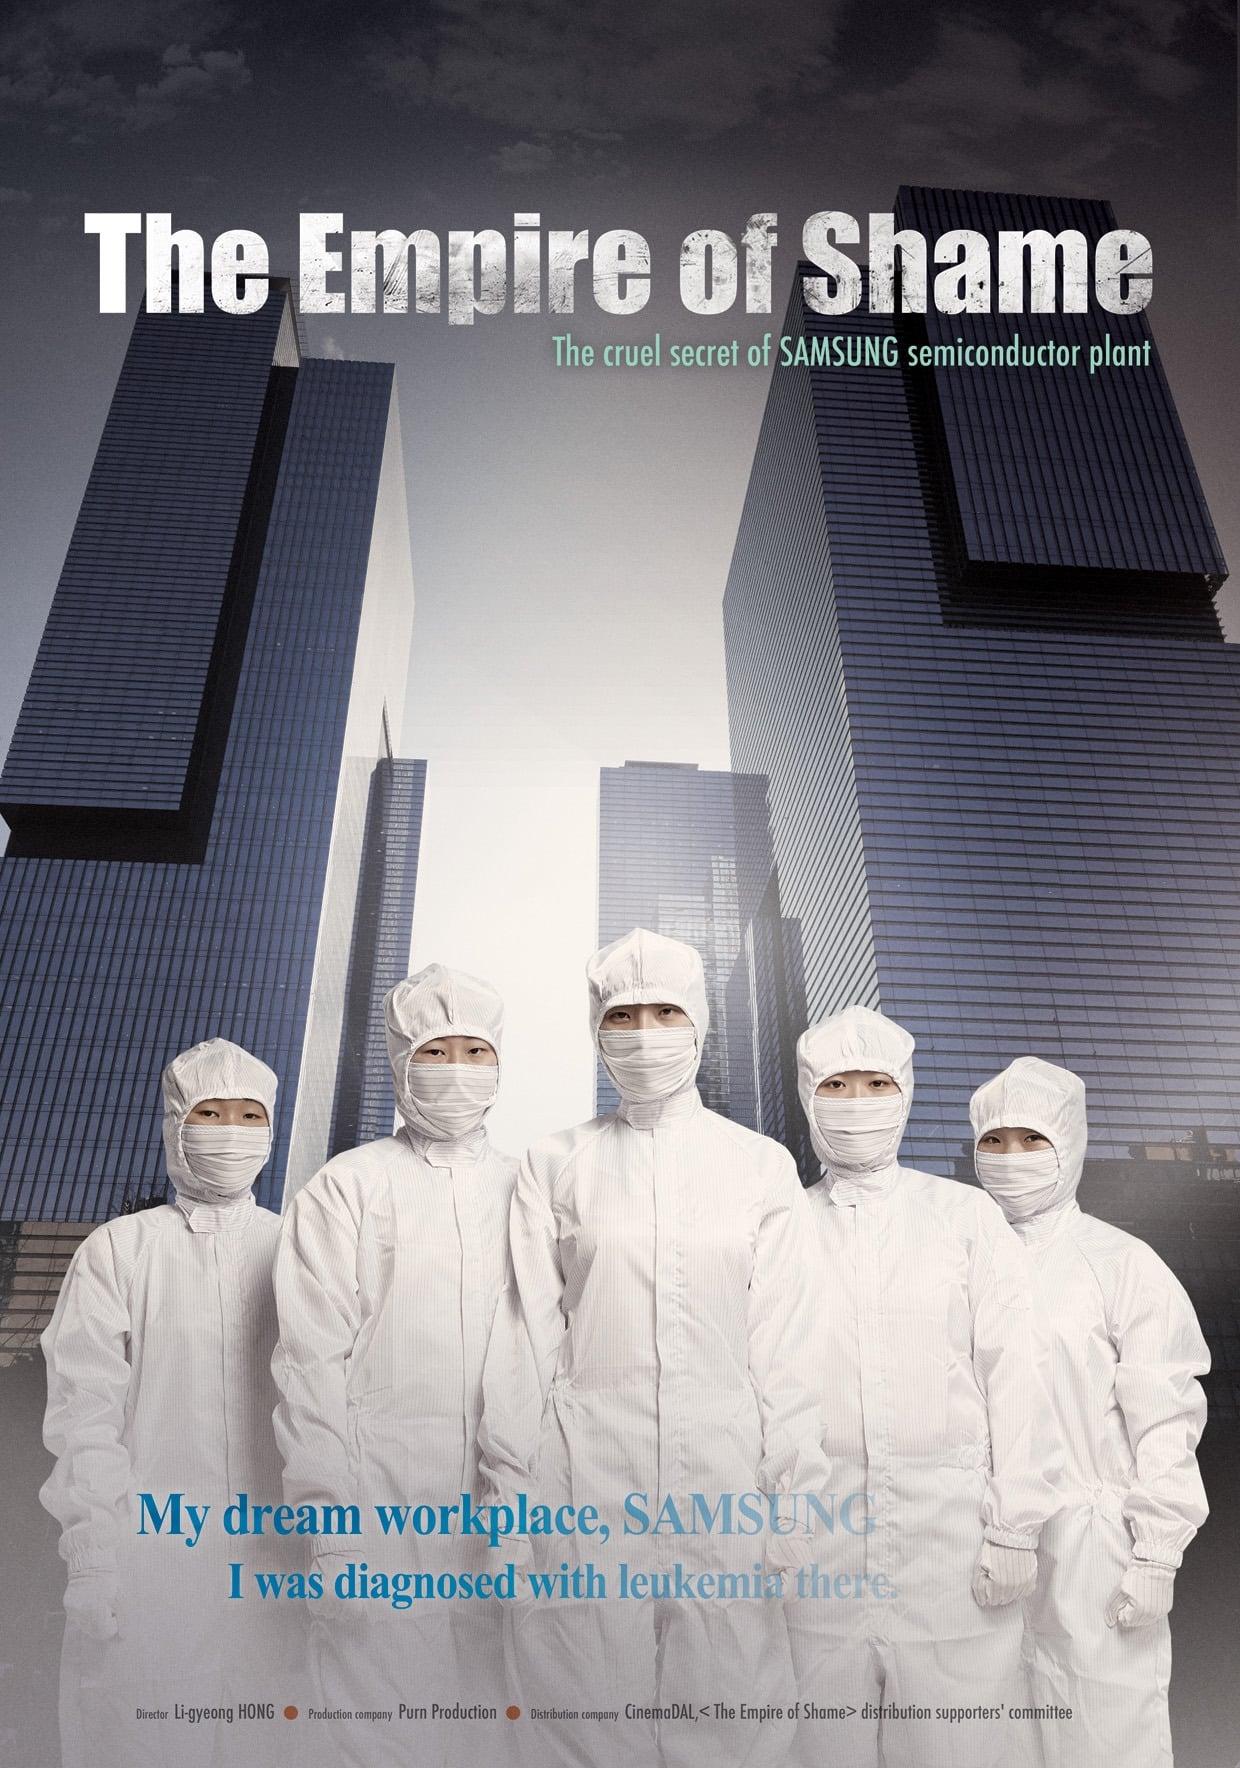 The Empire of Shame